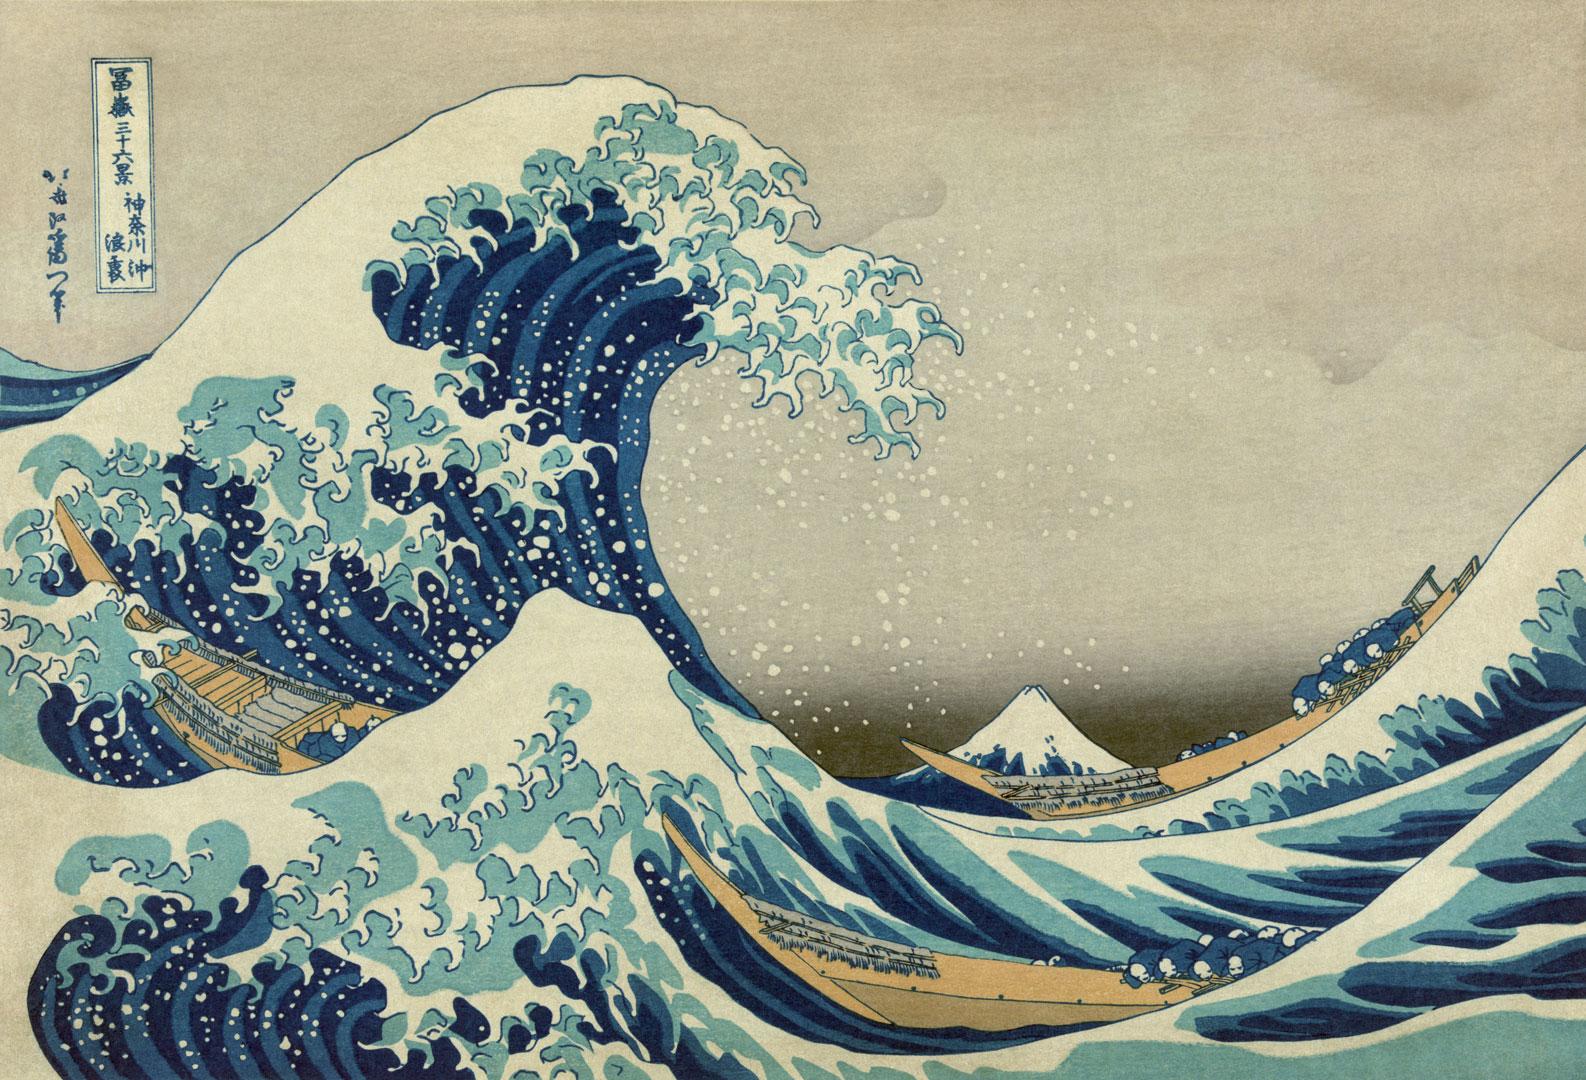 Hiroshige's Great Wave off Kanagawa